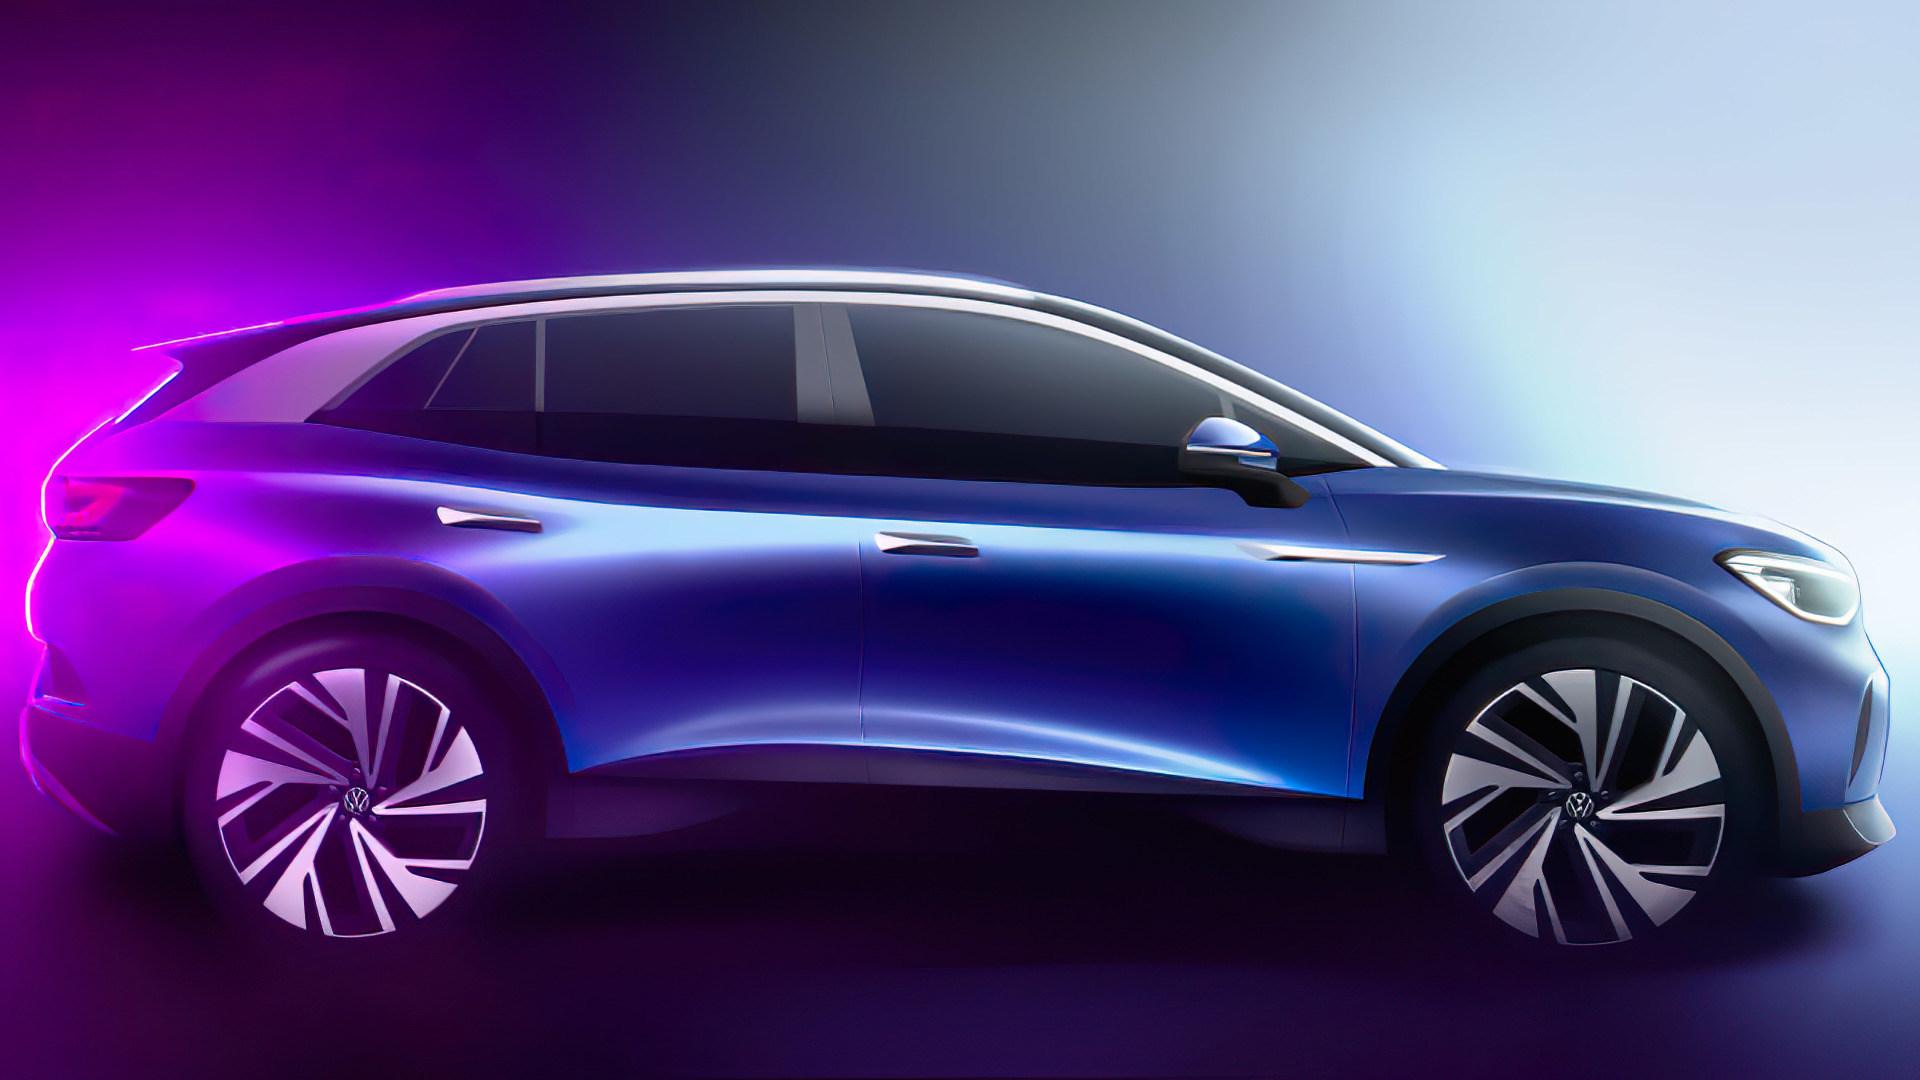 Elektromobilität, Elektroauto, E-Auto, Vw, volkswagen, ID.4, Volkswagen ID